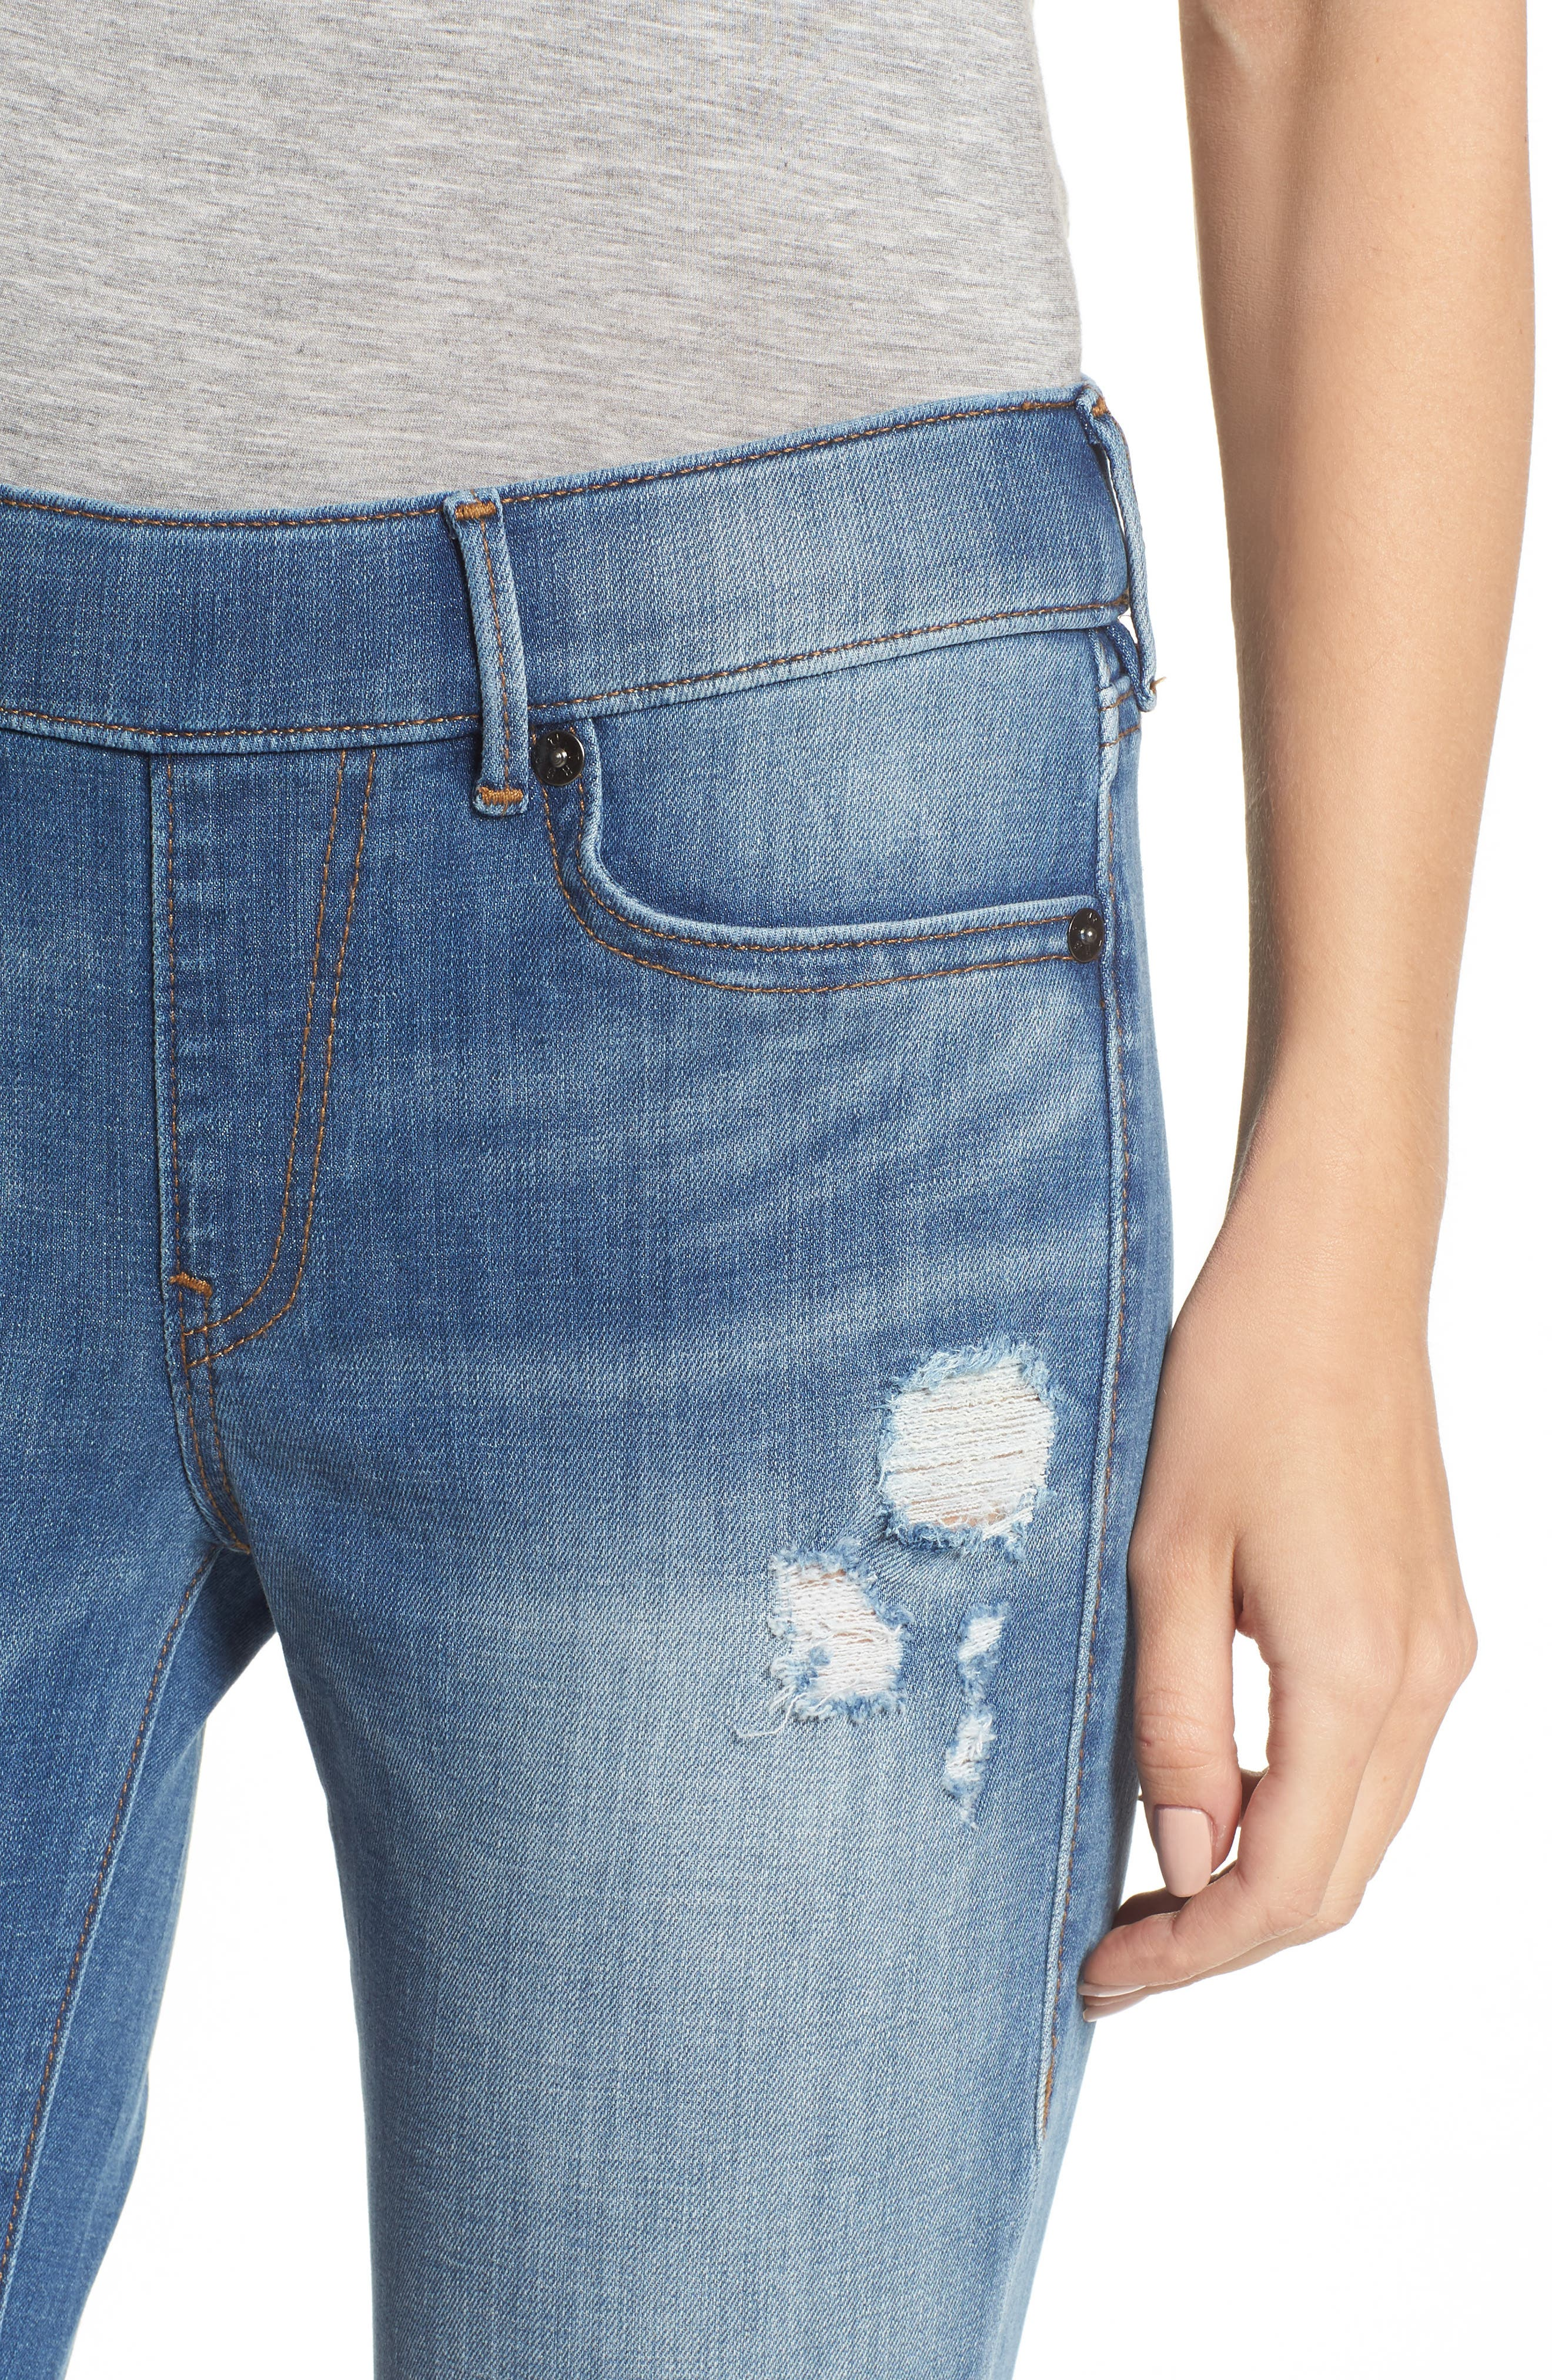 Jennie Runway Curvy Skinny Jeans,                             Alternate thumbnail 4, color,                             400